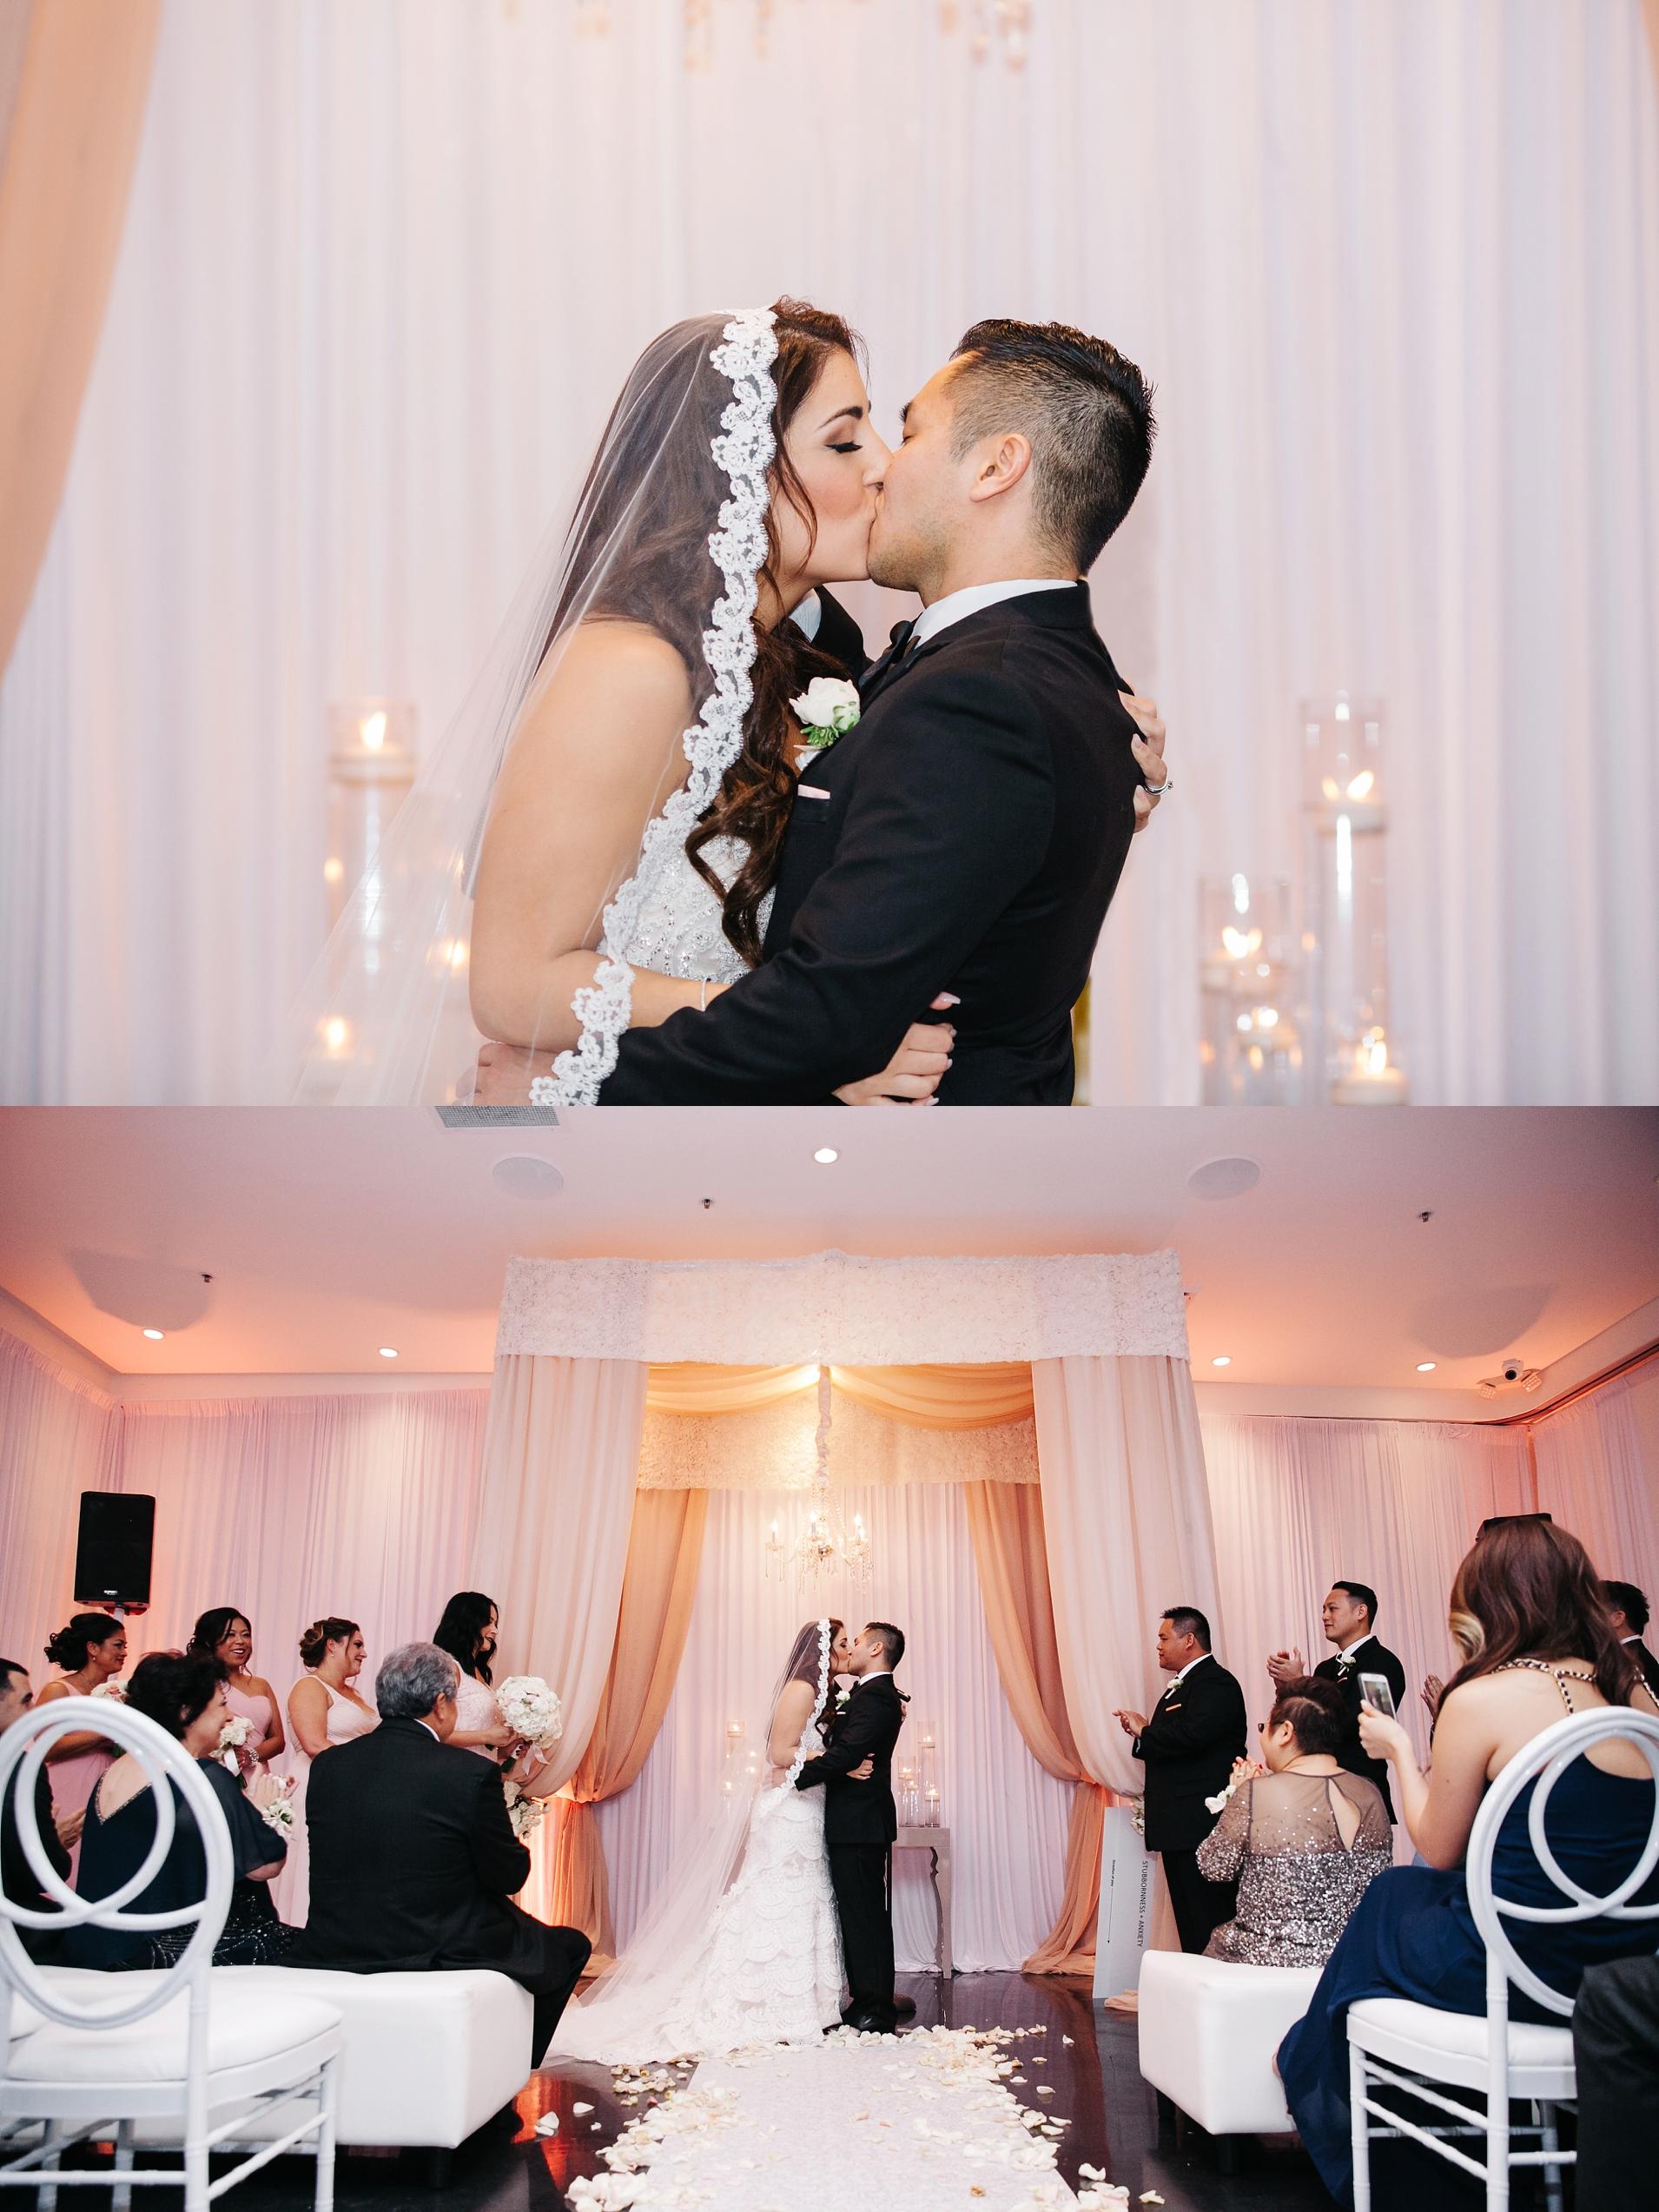 Wedding Ceremony Photos at Venue by Three Petals Wedding by Brittney Hannon Photography